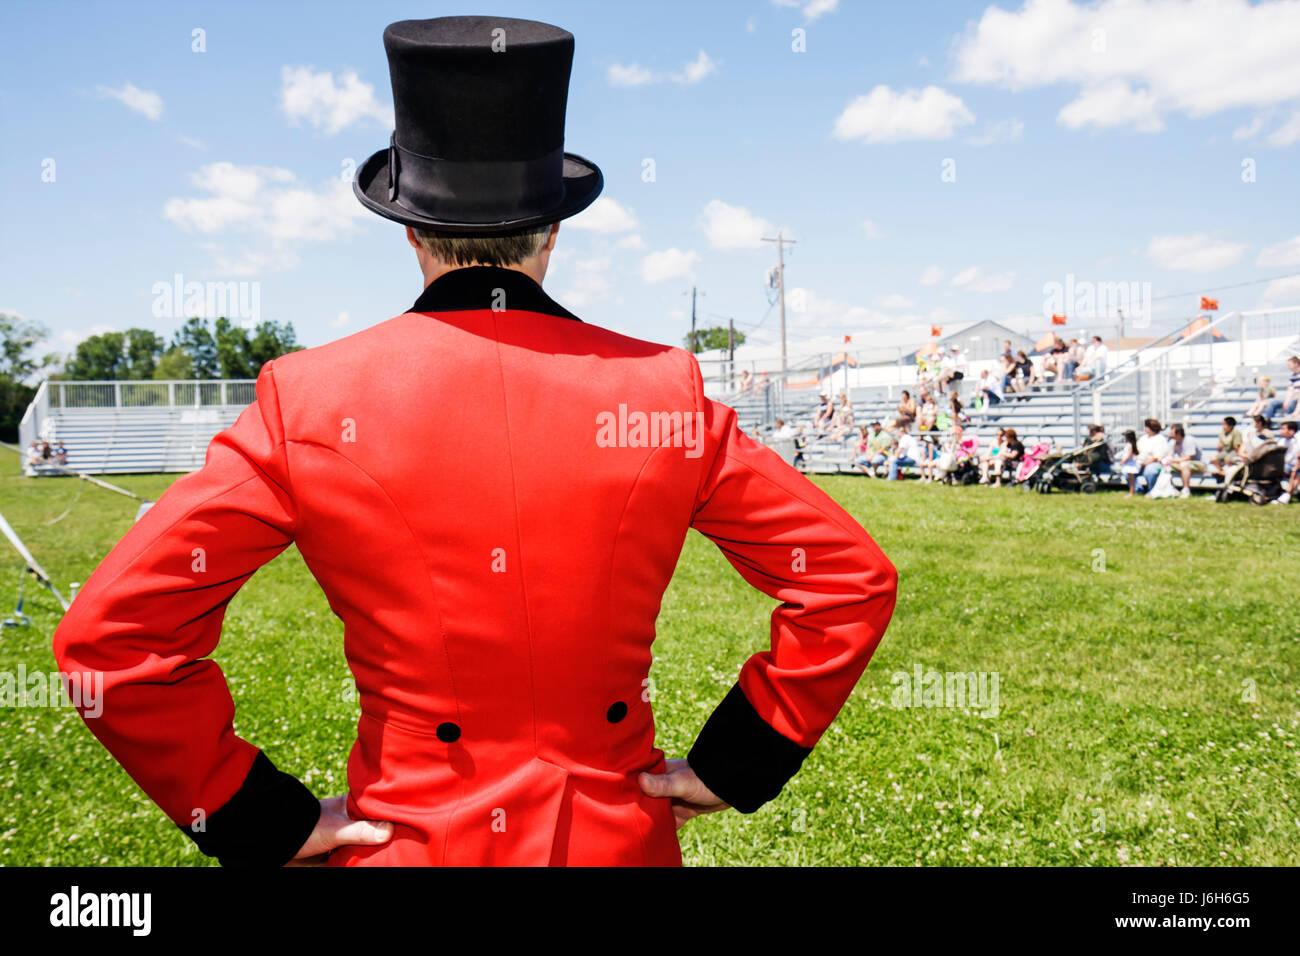 Wisconsin Kenosha Kenosha County Fairgrounds The Ultimate Kid Fest family event circus ringmaster red coat top hat - Stock Image